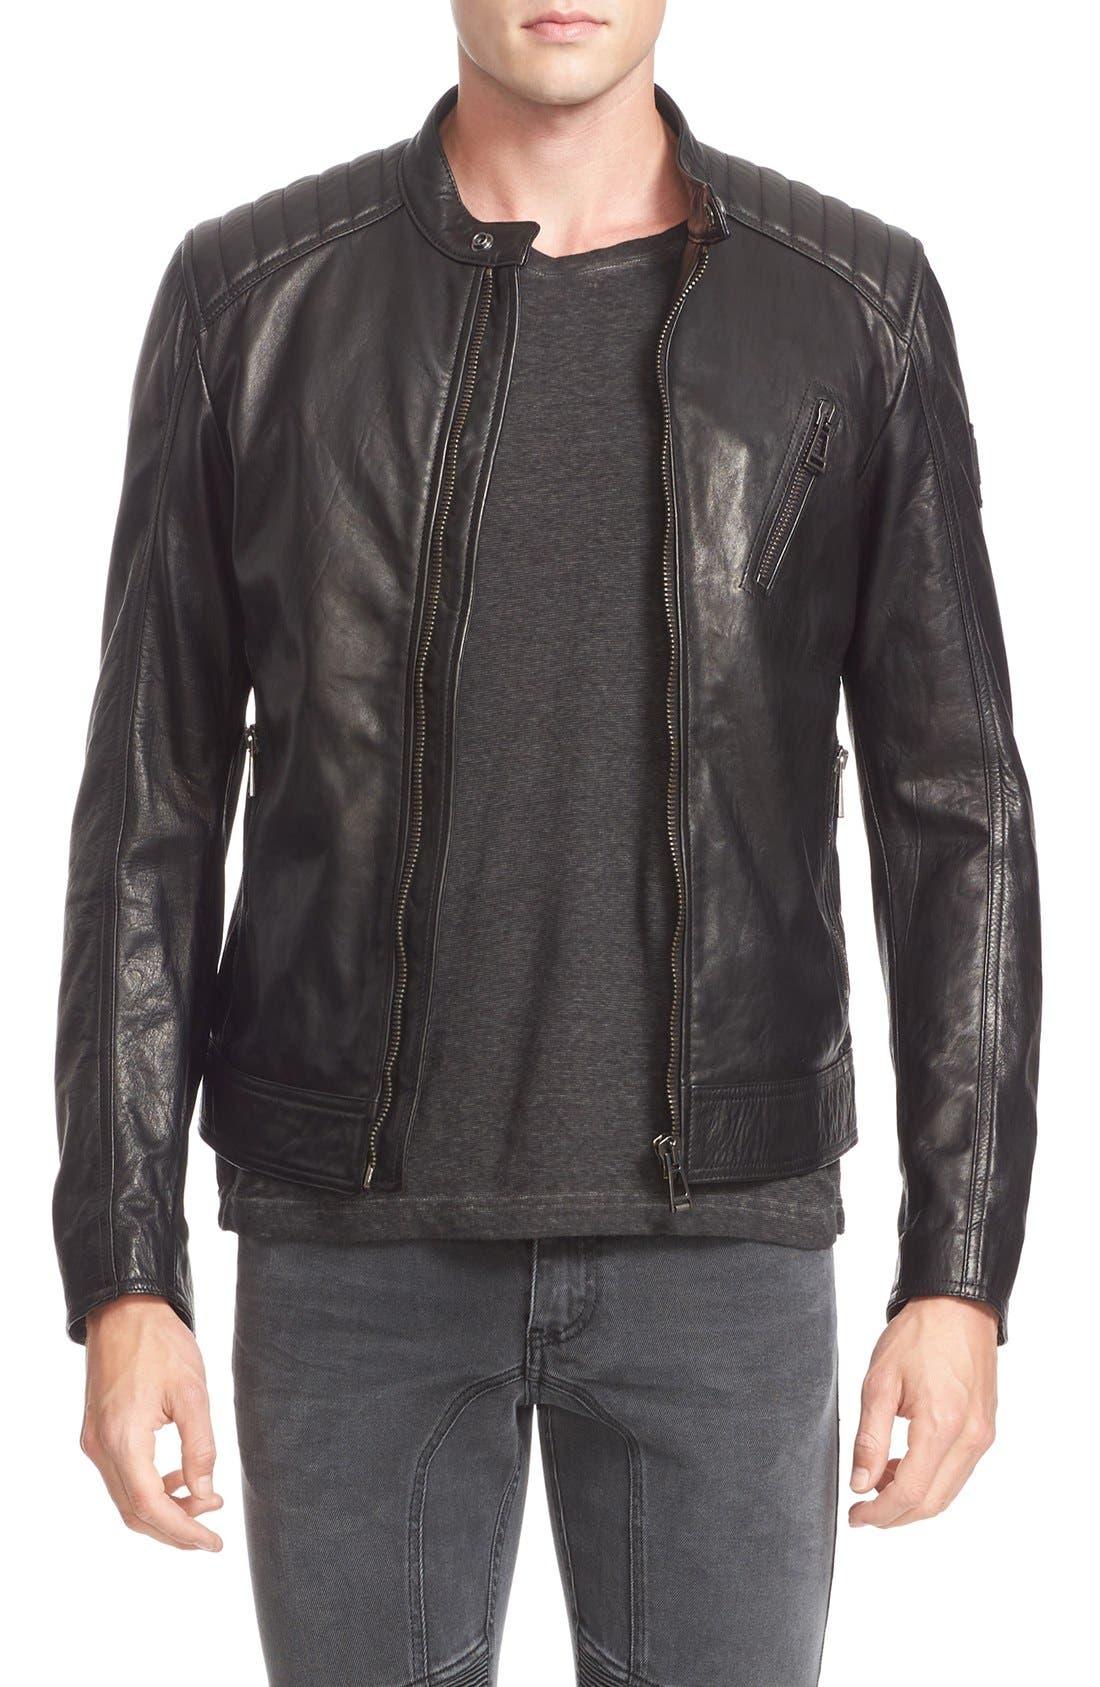 V Racer Leather Jacket,                             Main thumbnail 1, color,                             001